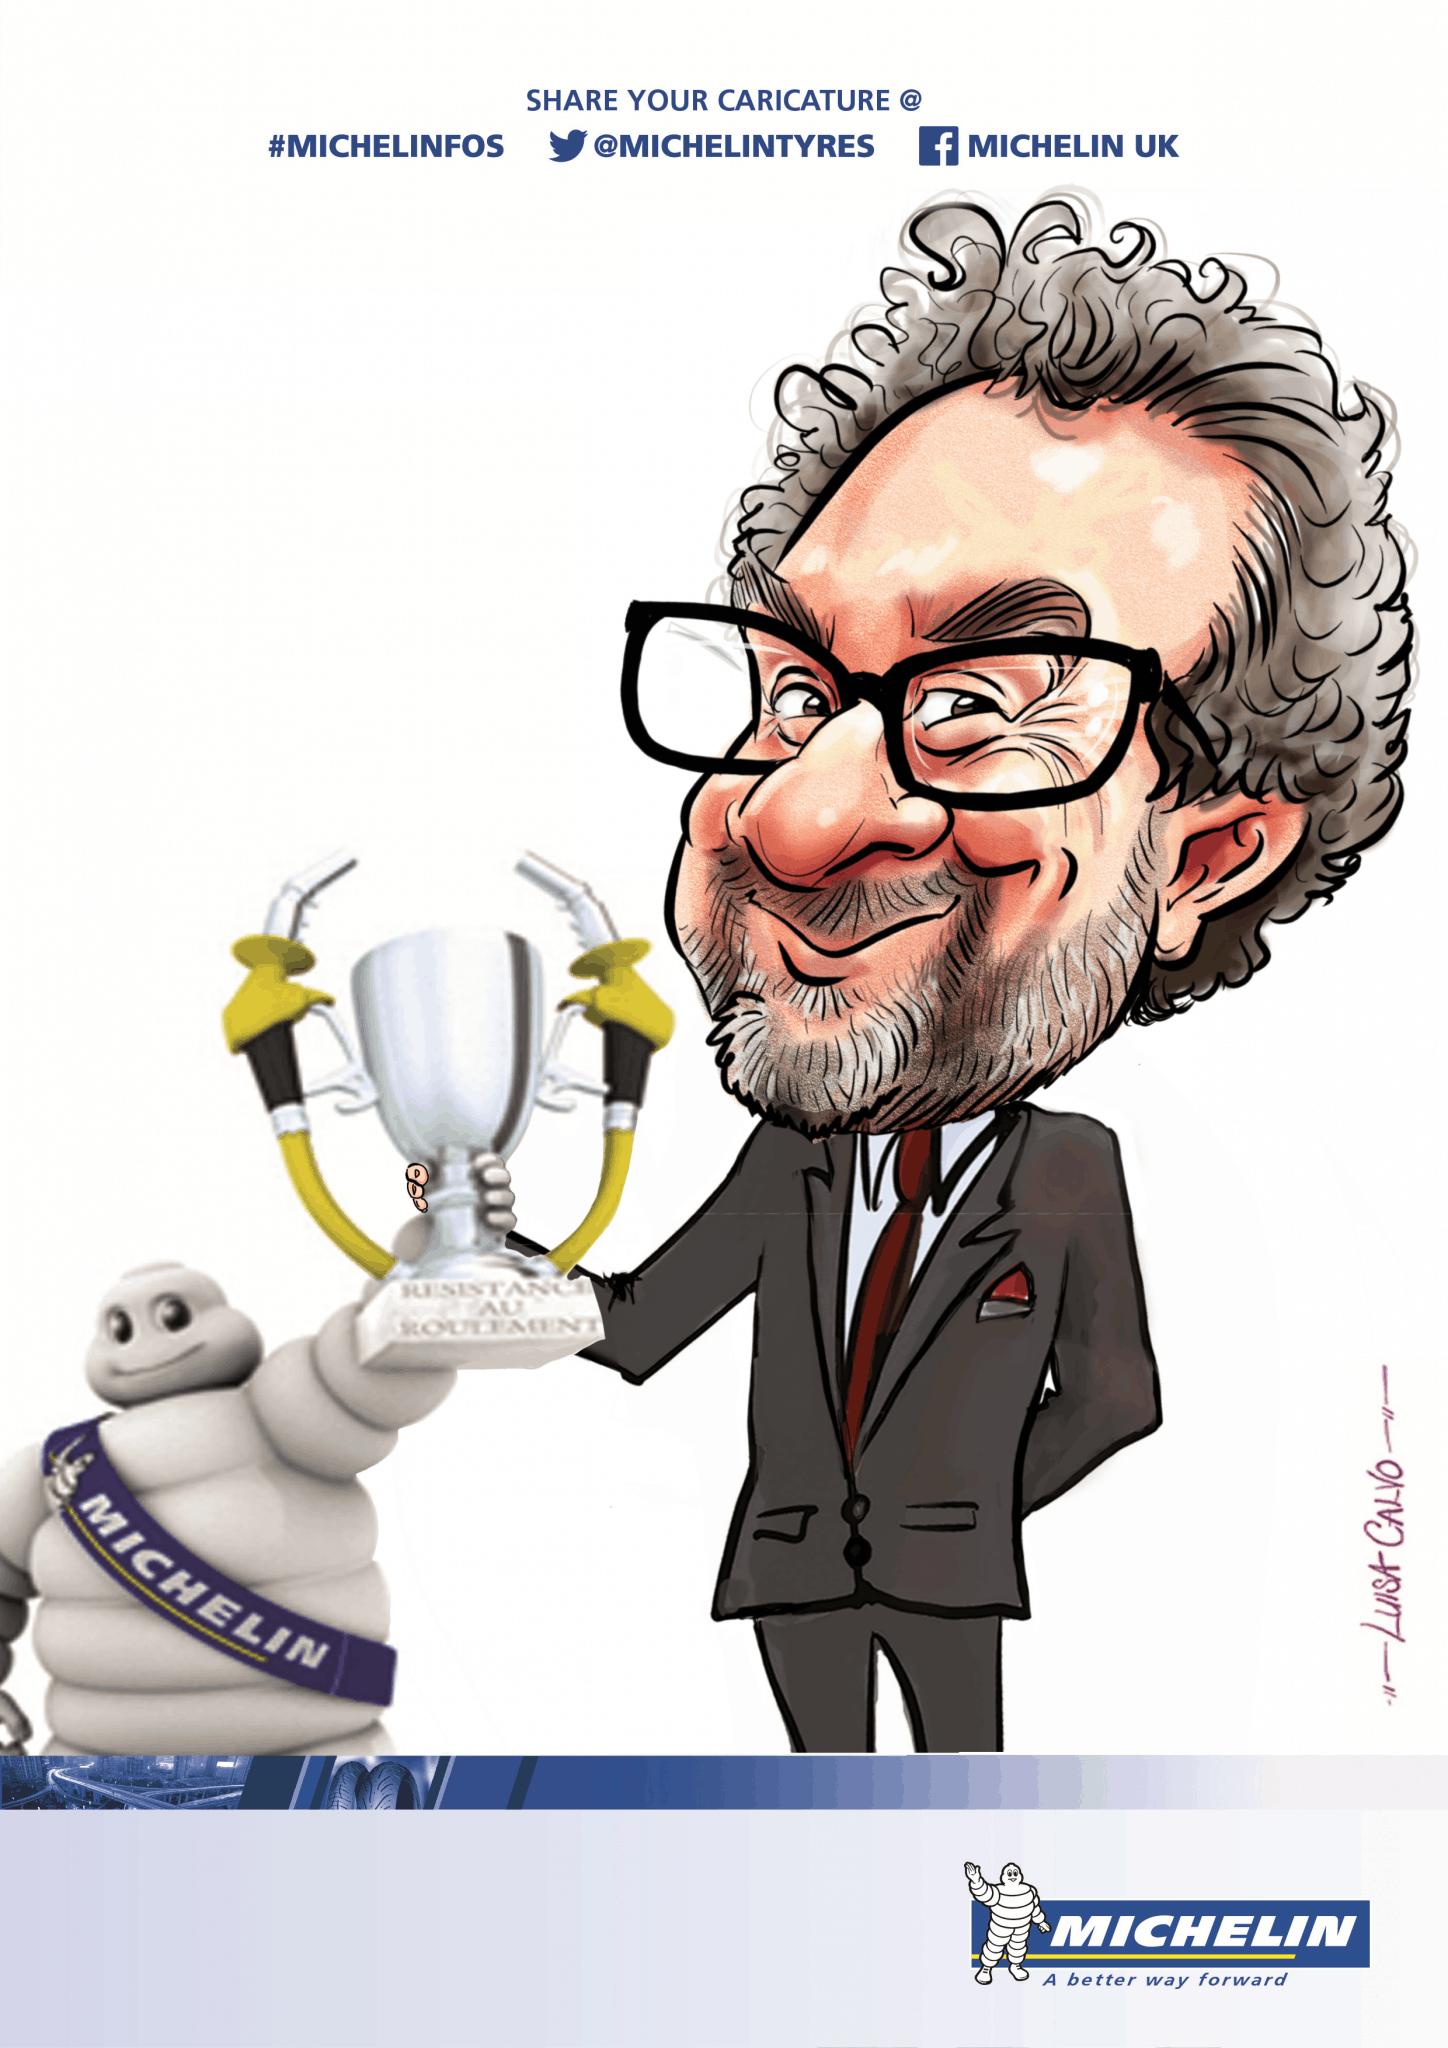 Michelin man themed caricature – by Luisa Calvo